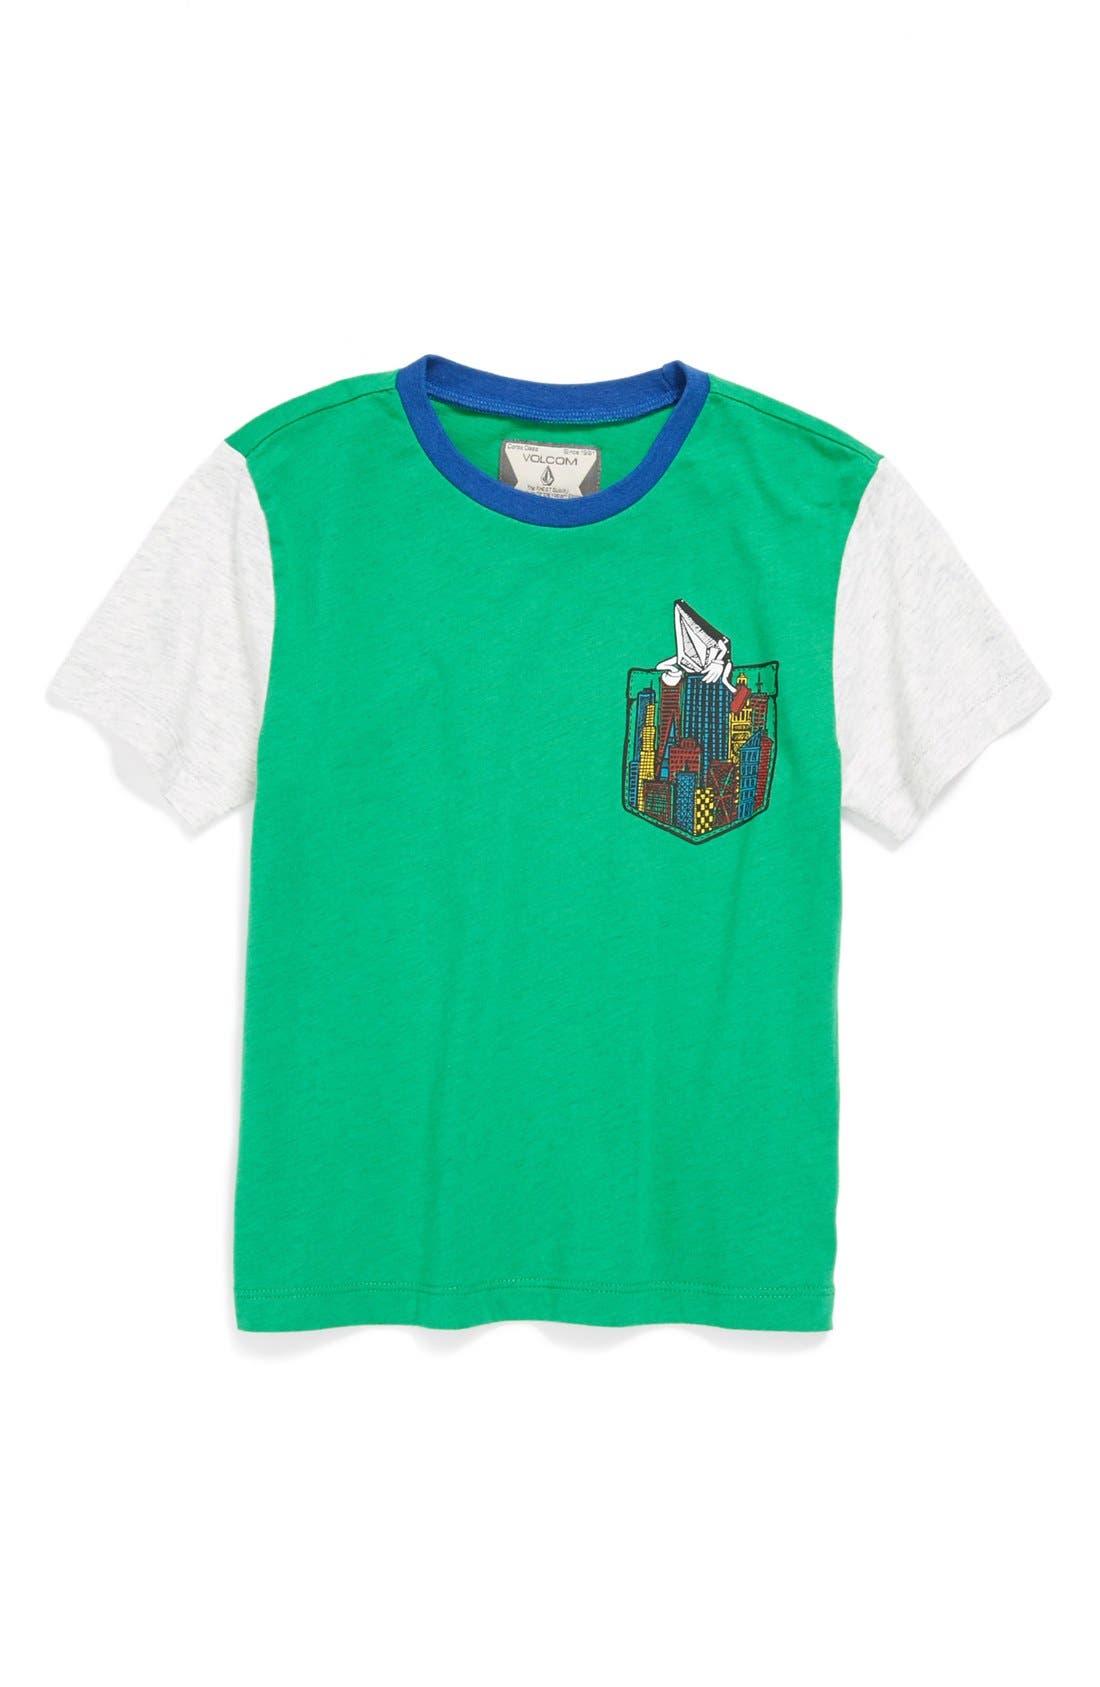 Alternate Image 1 Selected - Volcom 'Hang On' Crewneck T-Shirt (Toddler)